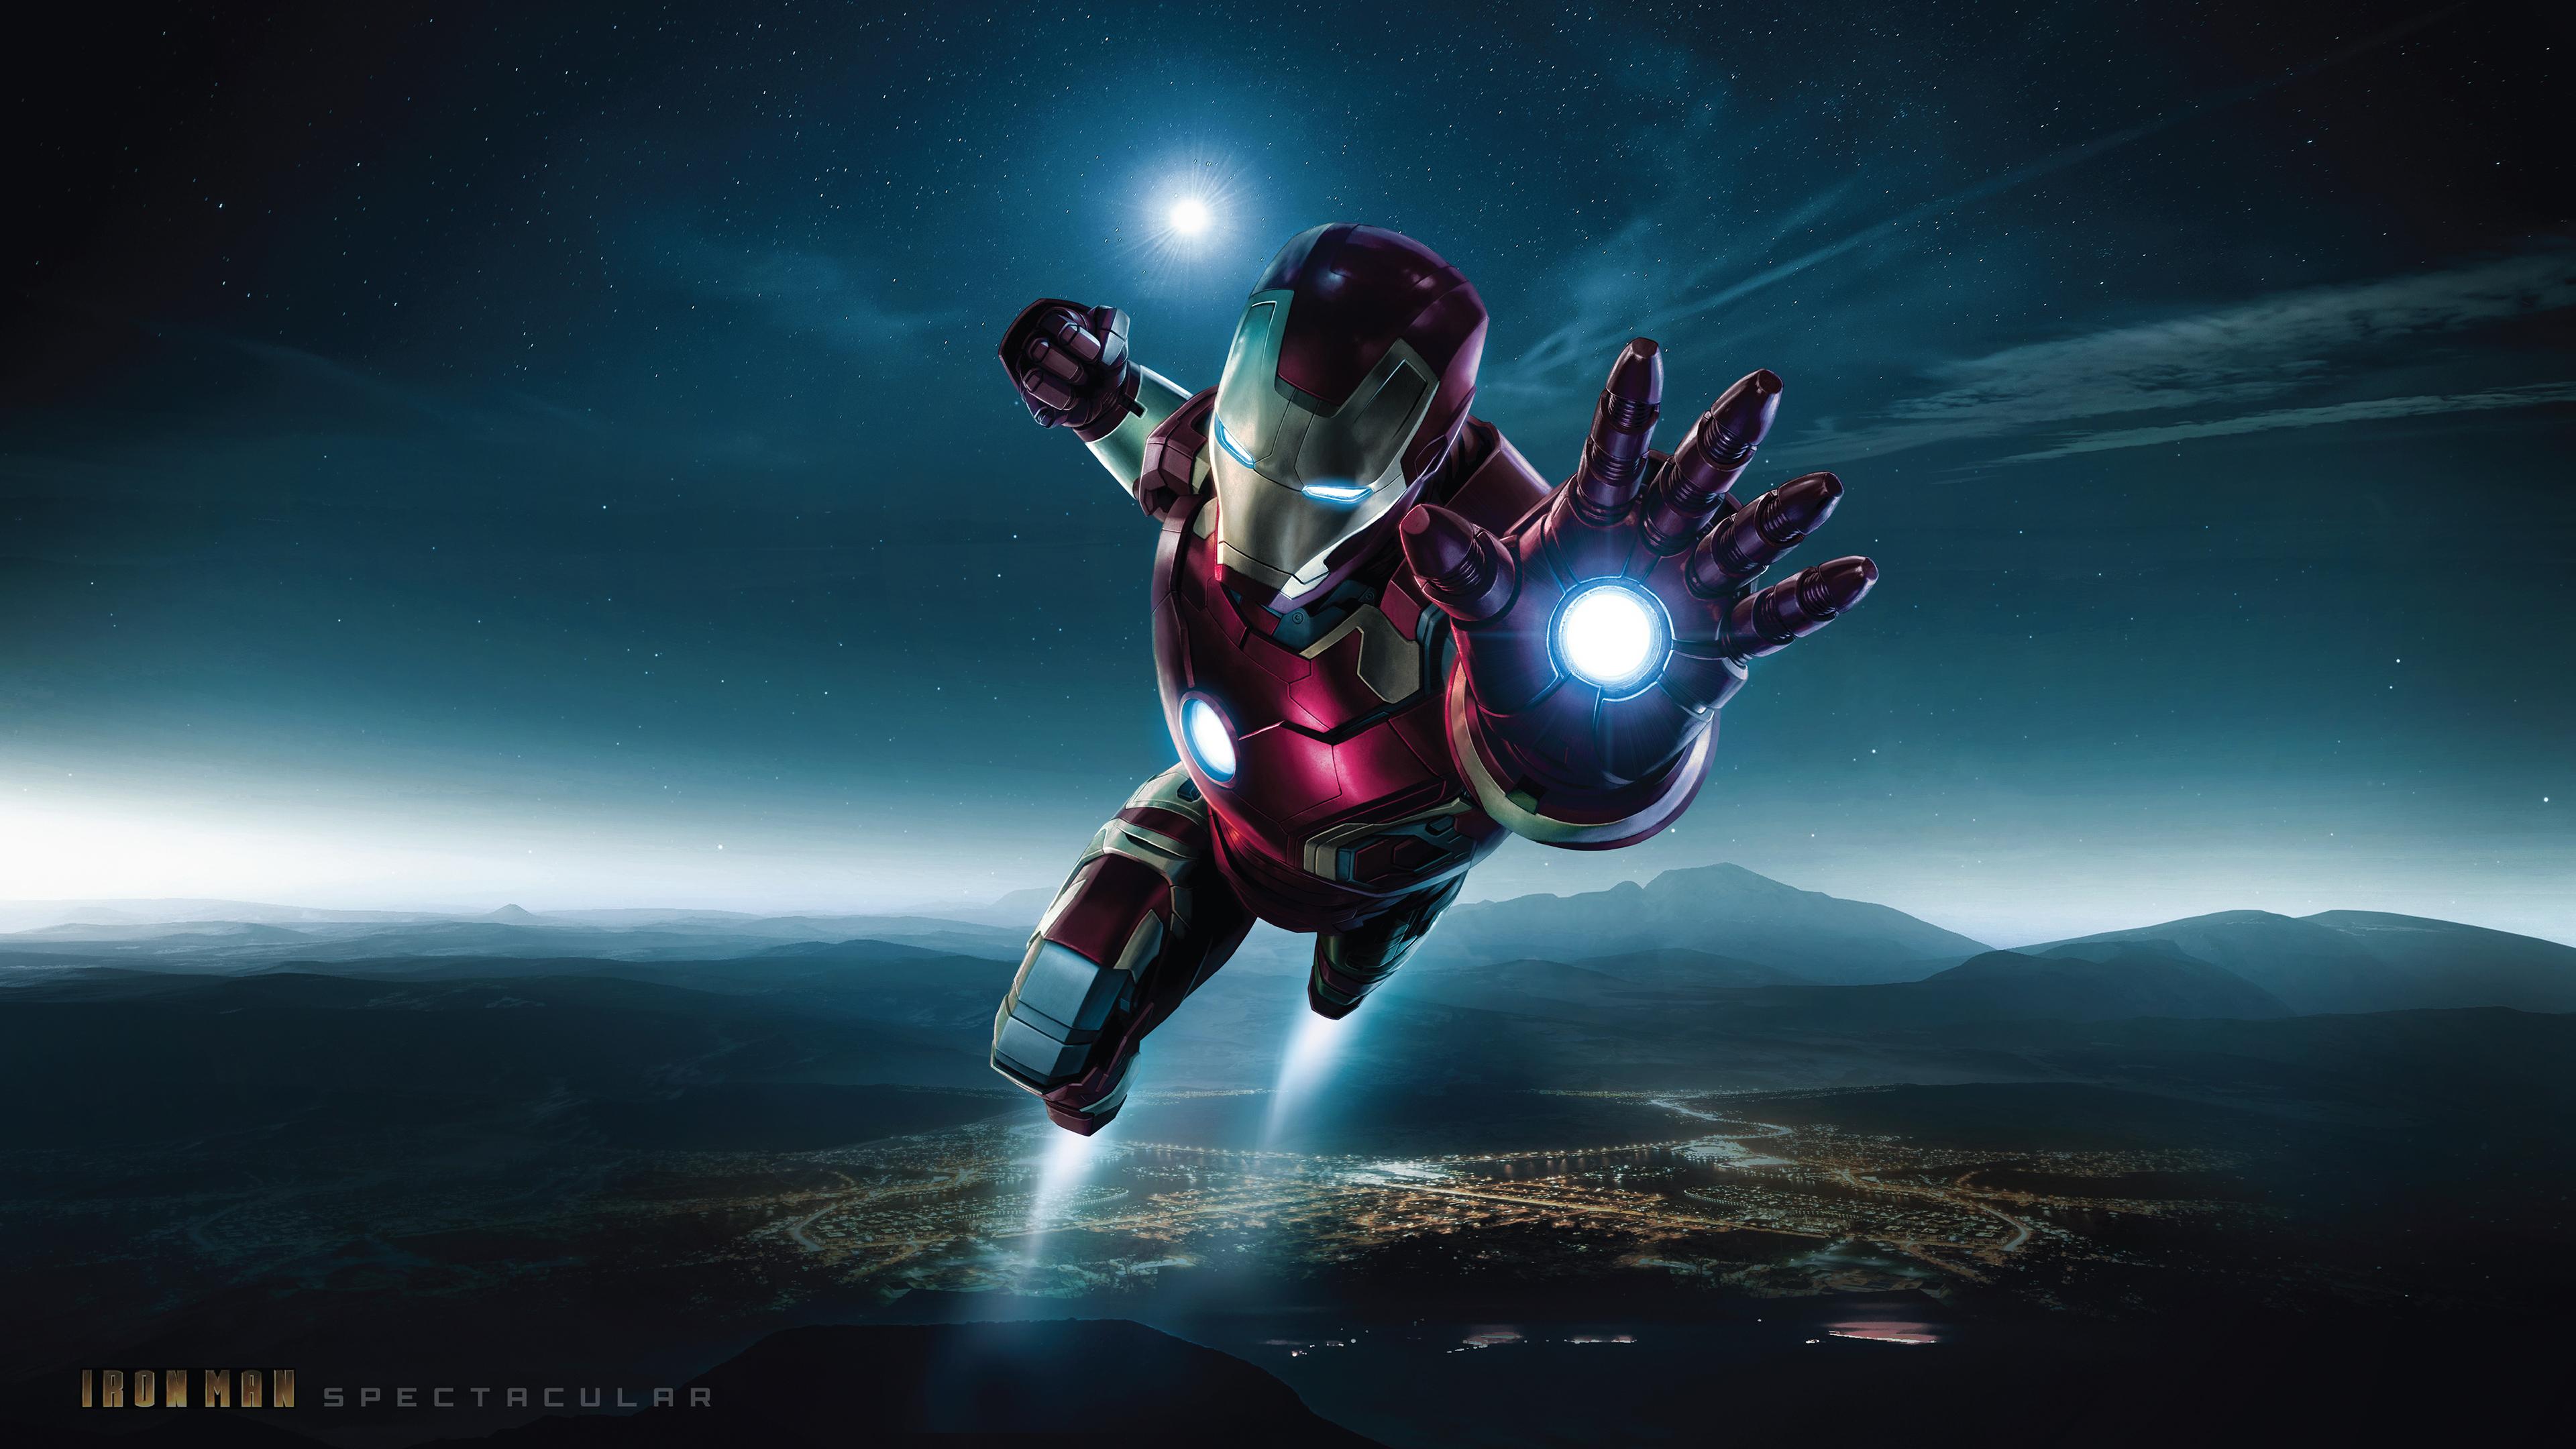 Iron man 4k ultra hd wallpaper background image 3840x2160 id 969585 wallpaper abyss - Iron man wallpaper 4k ...